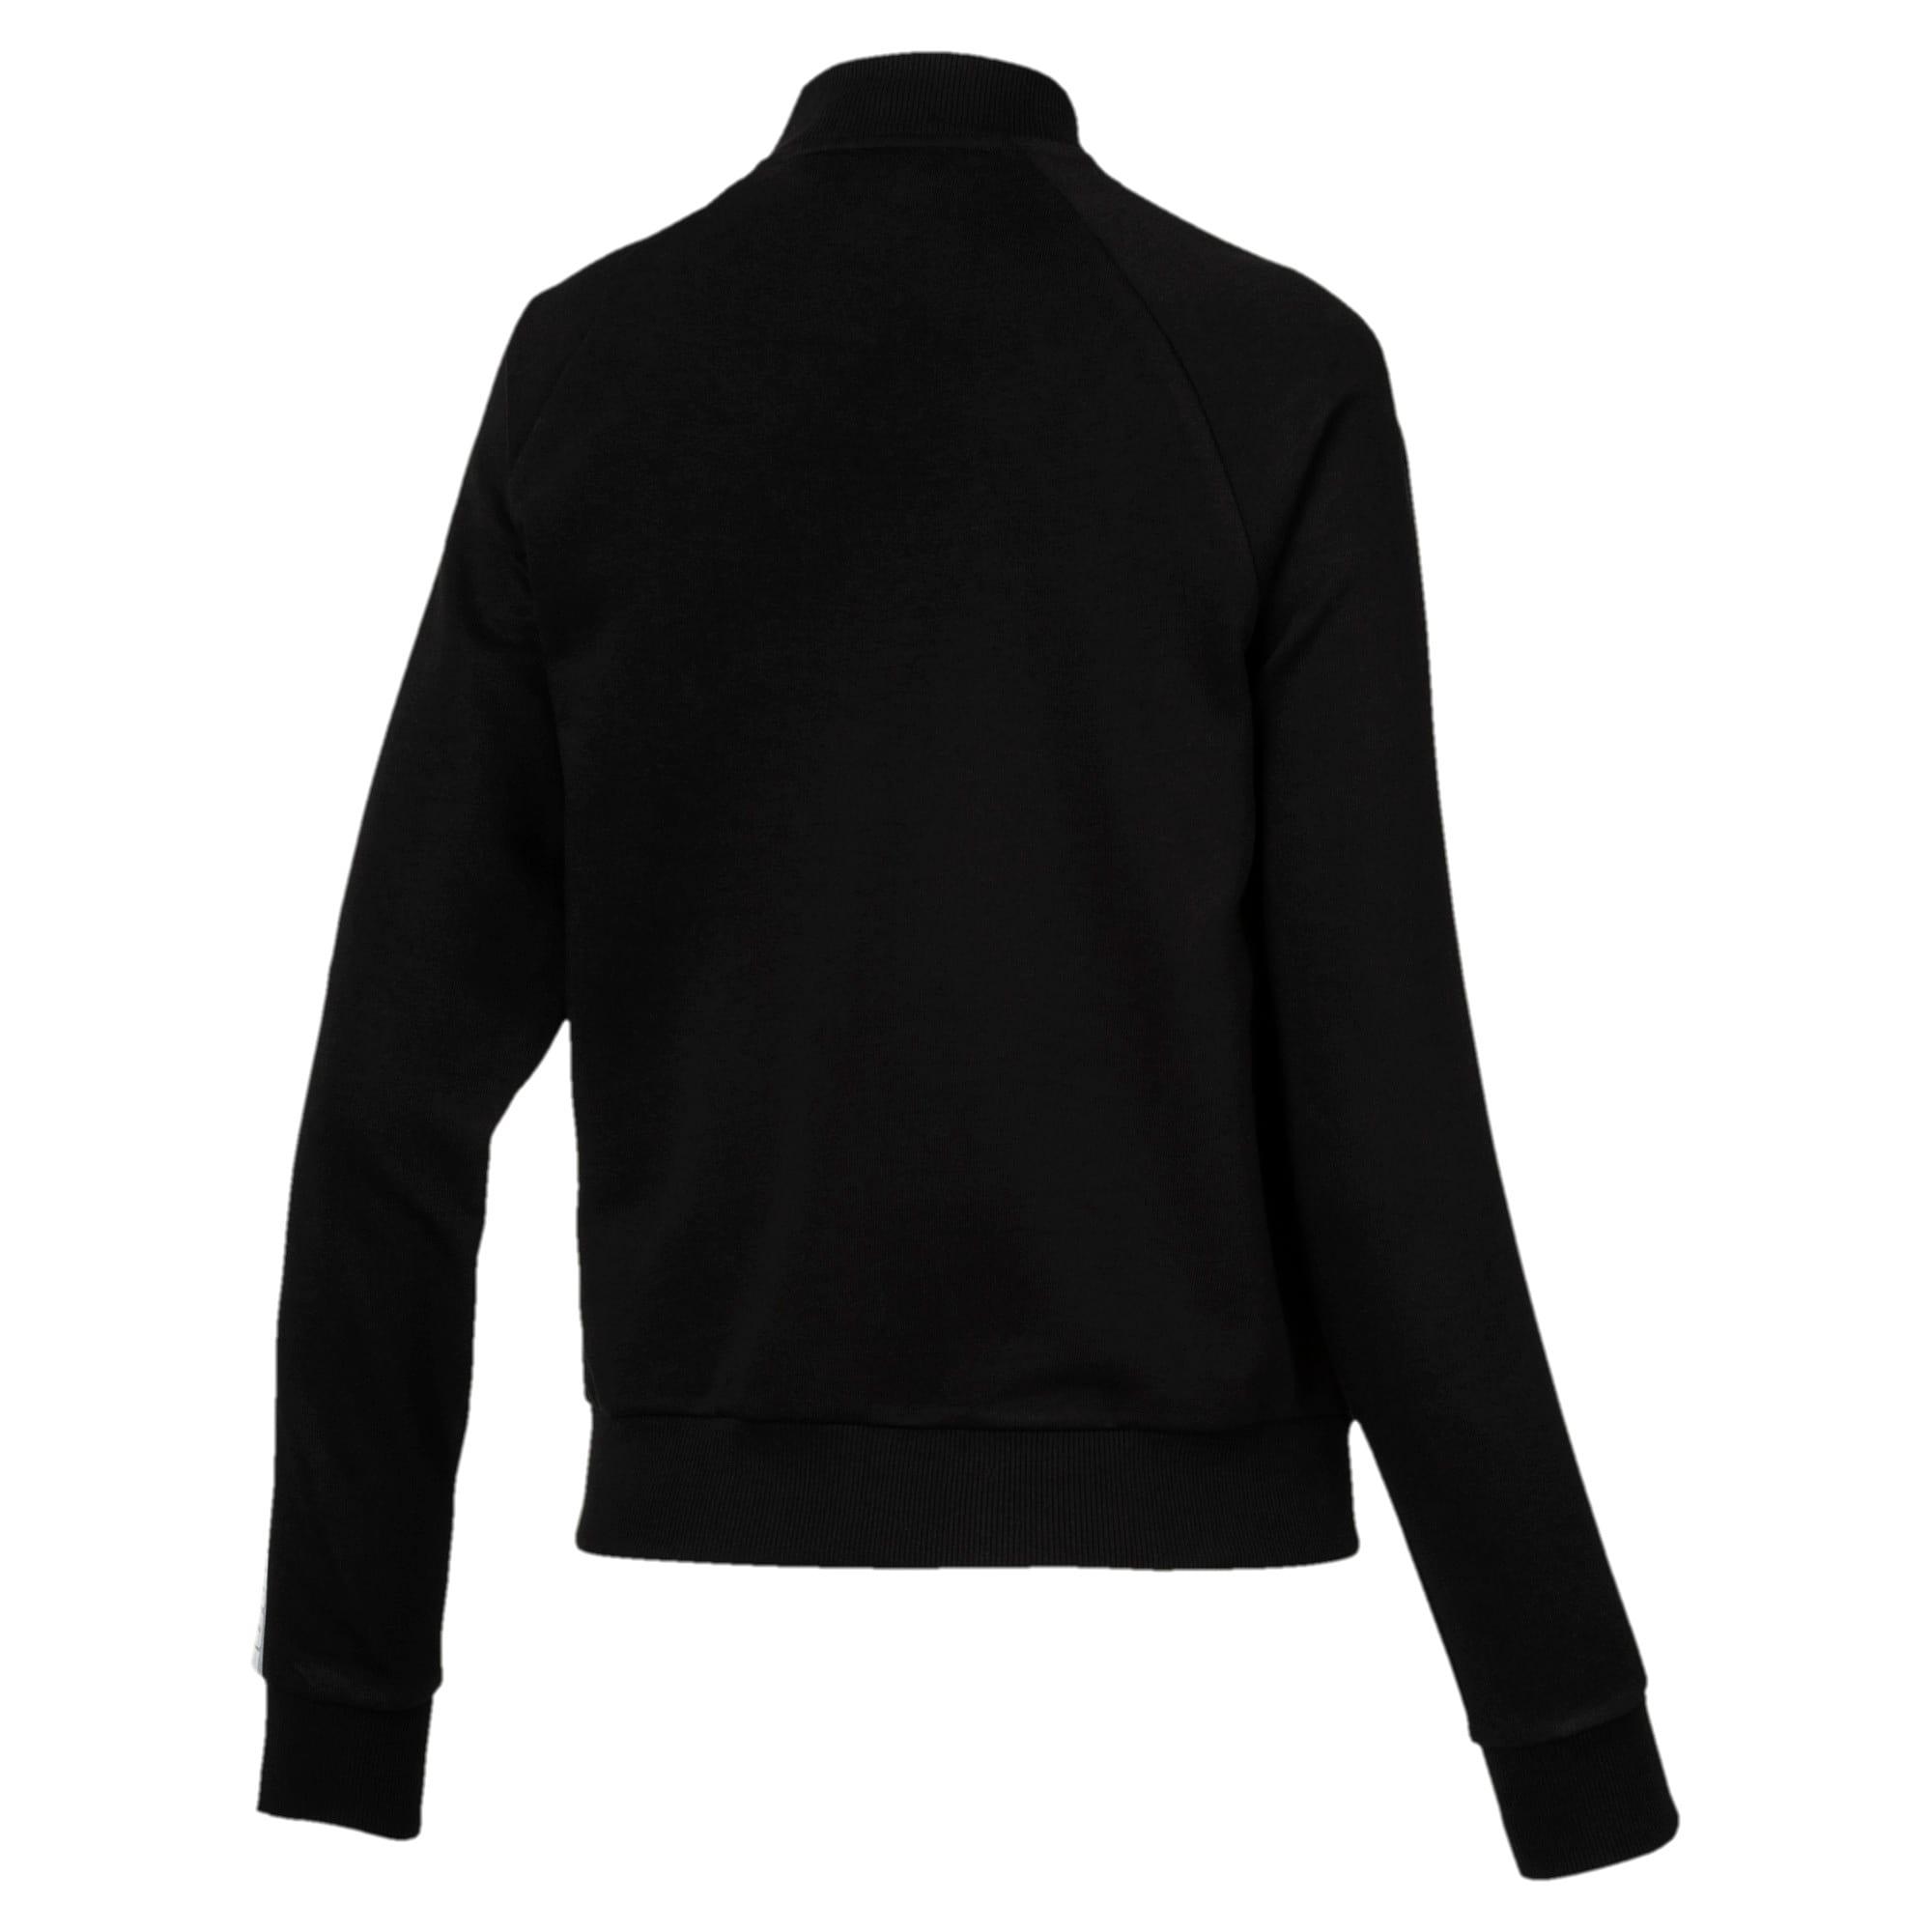 Thumbnail 3 of Tape Full Zip Women's Track Jacket, Cotton Black, medium